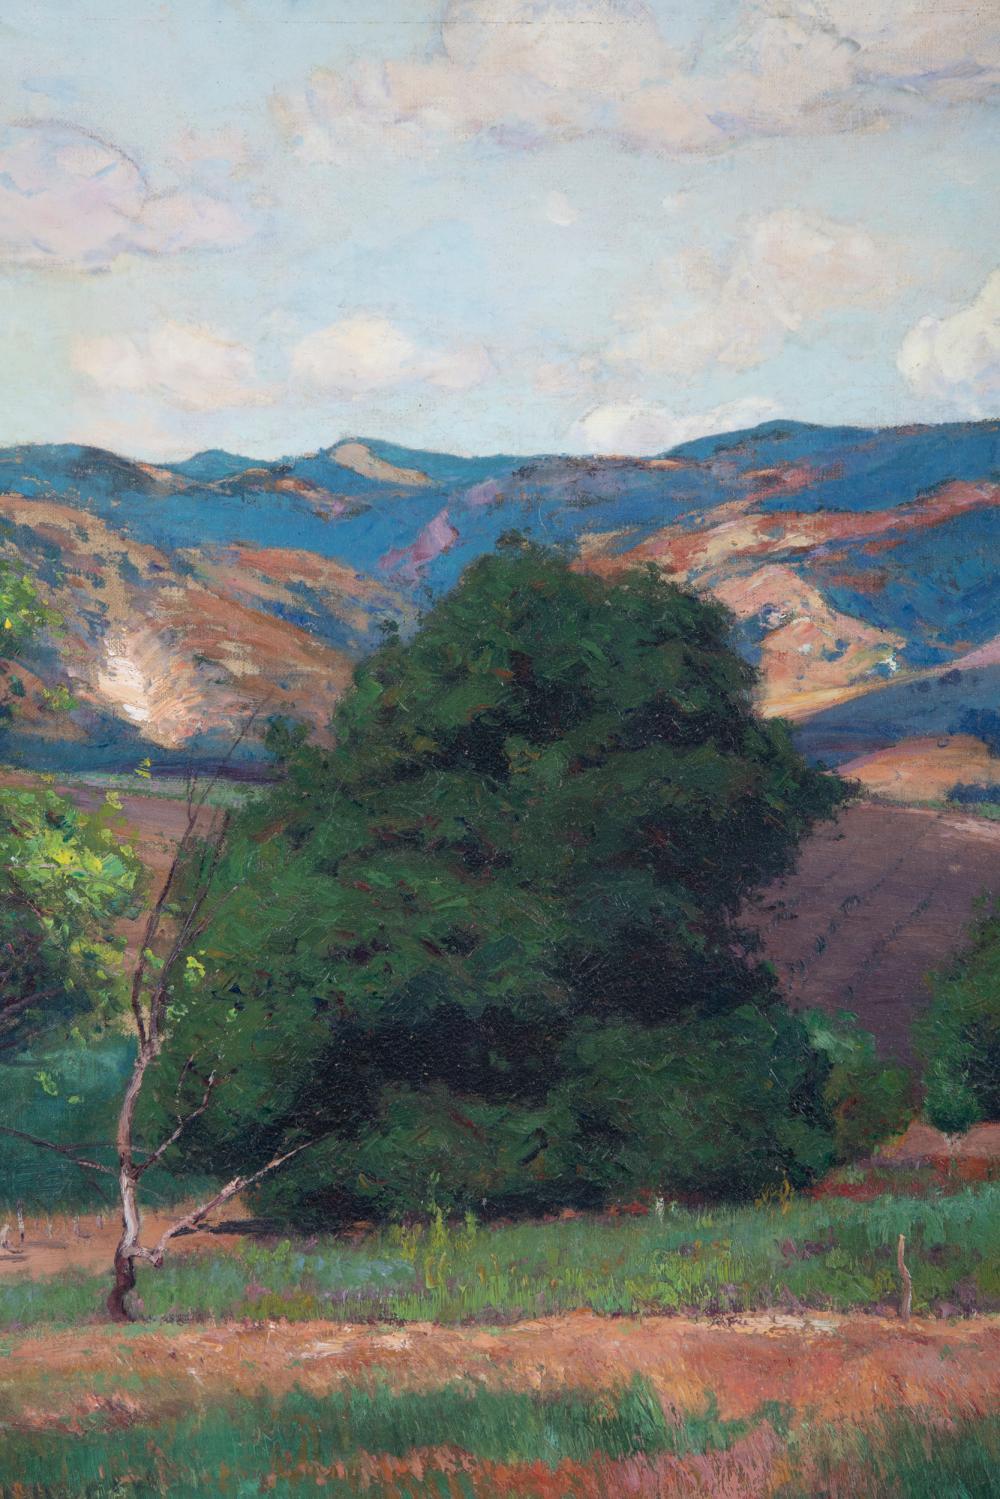 WILLIAM WENDT (1865 - 1946): CALIFORNIA LANDSCAPE